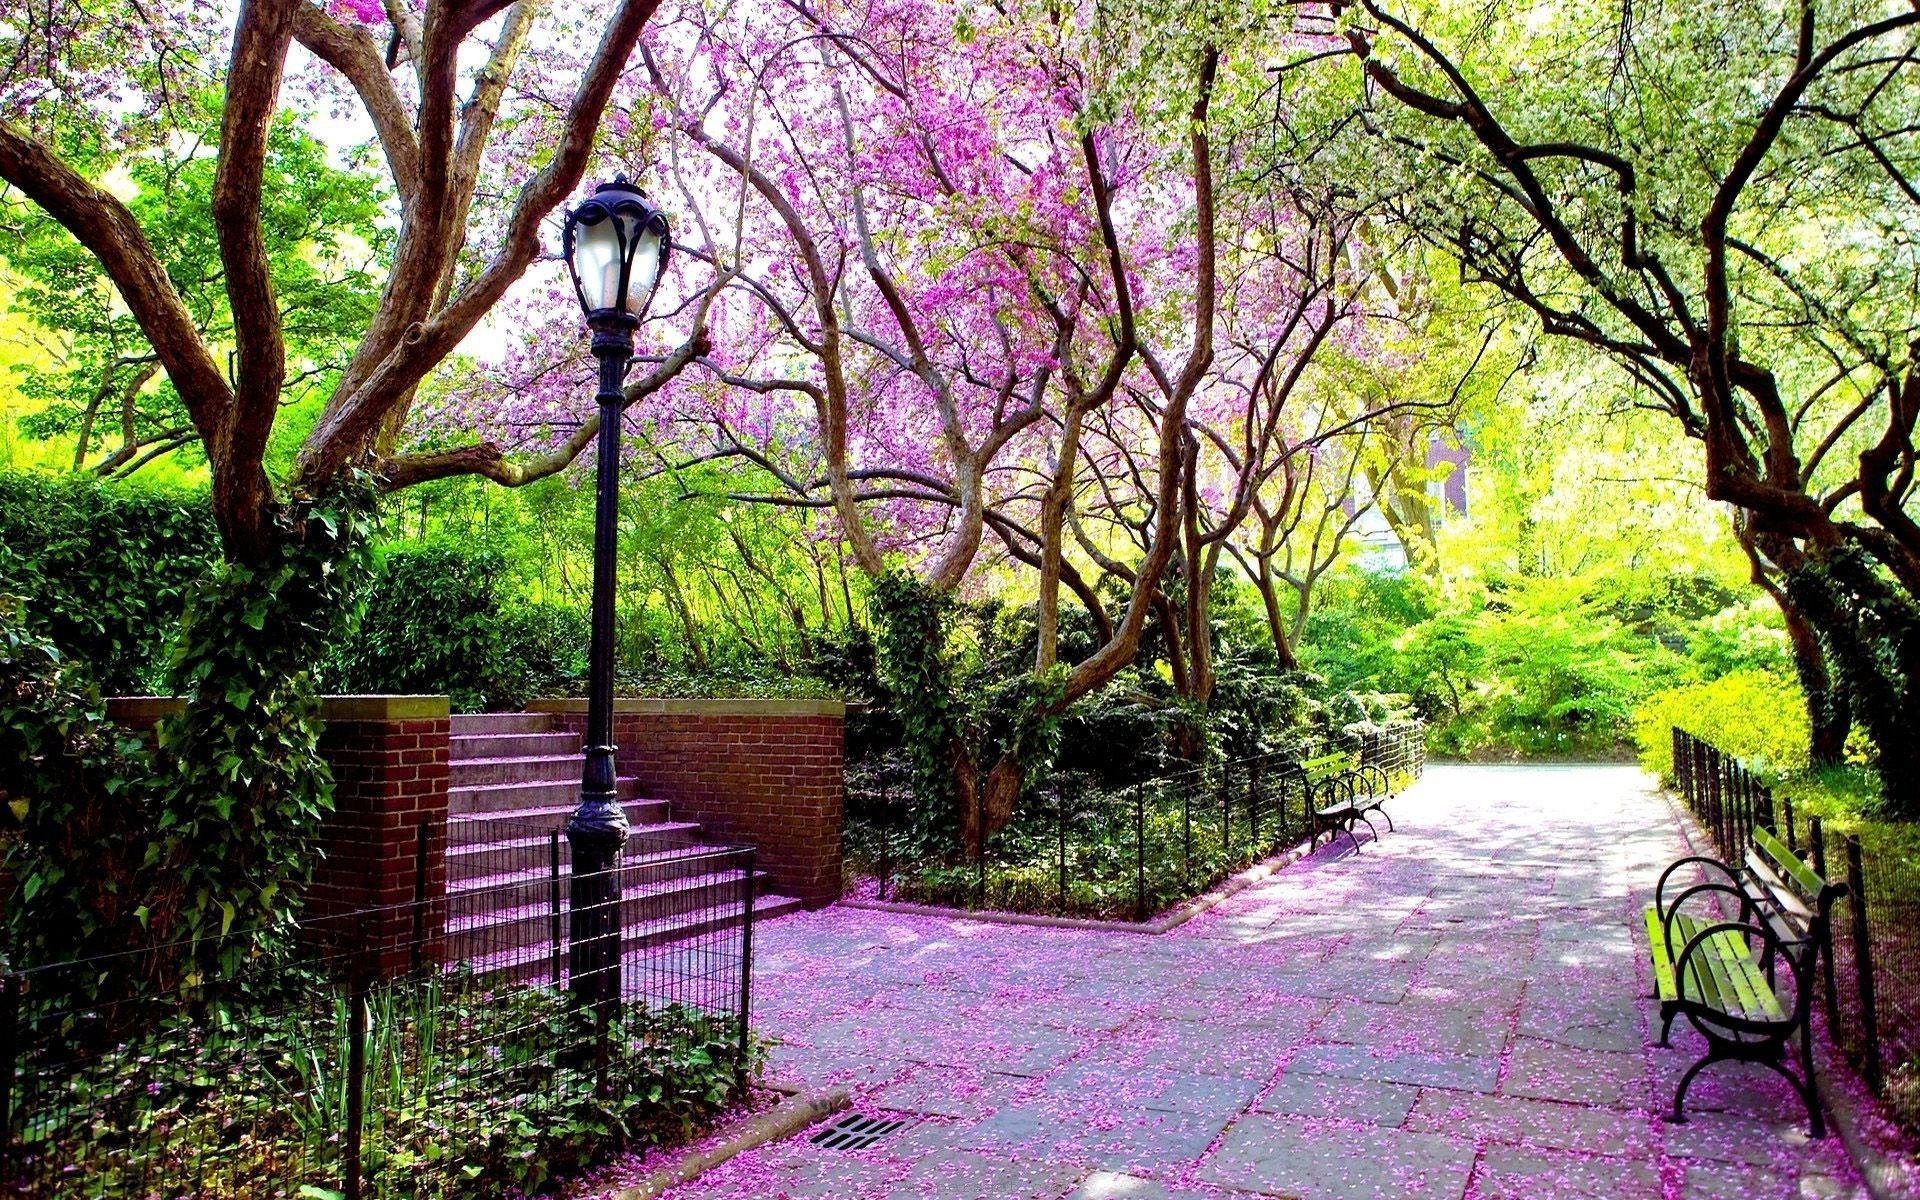 Hd wallpaper park - Flowers Park Tree Chairs Natural Hd Wallpaper